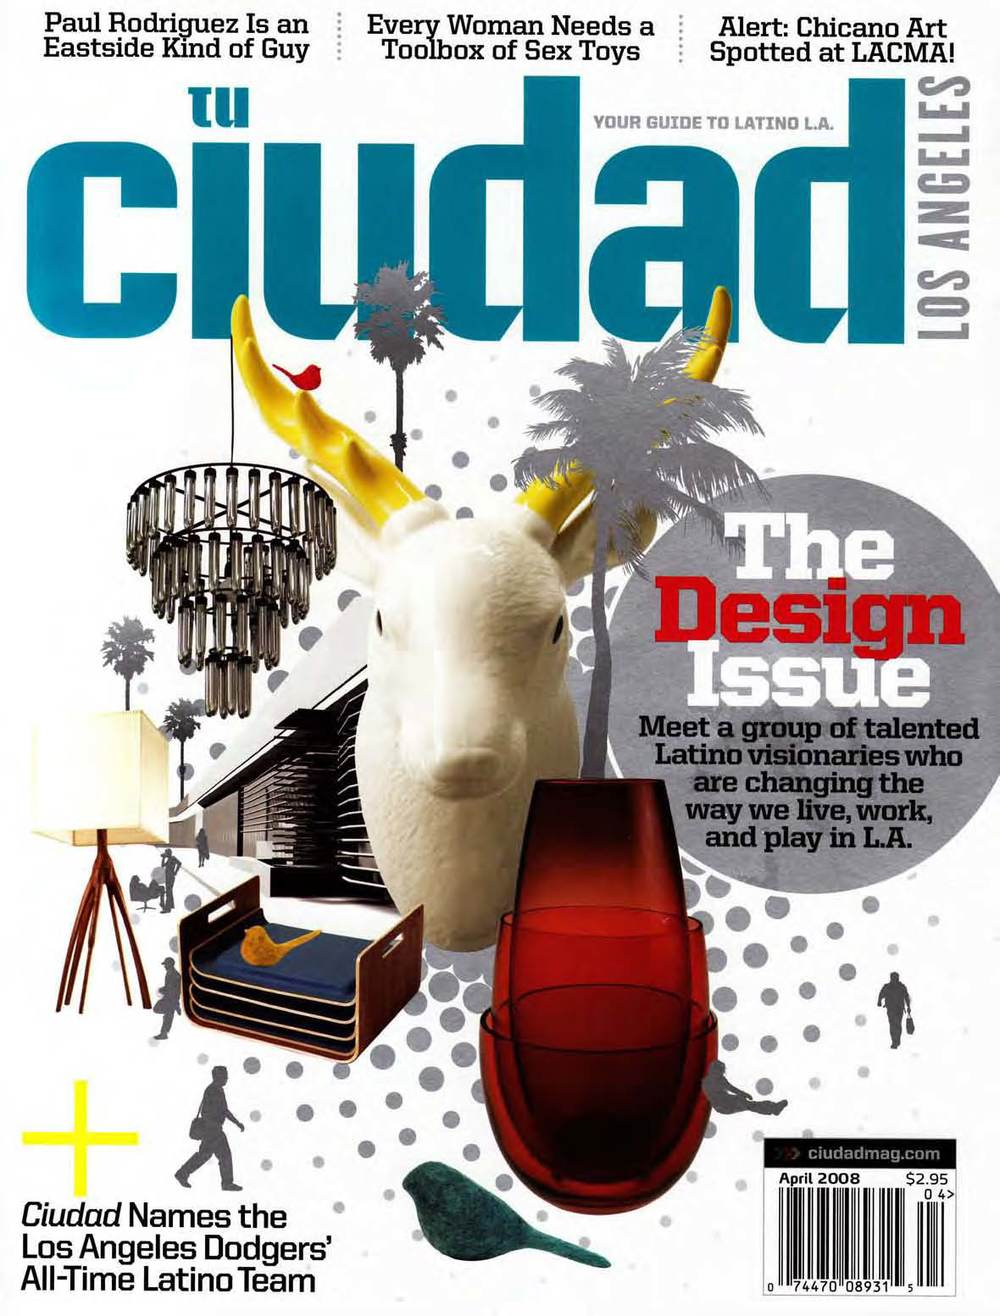 Special design issue